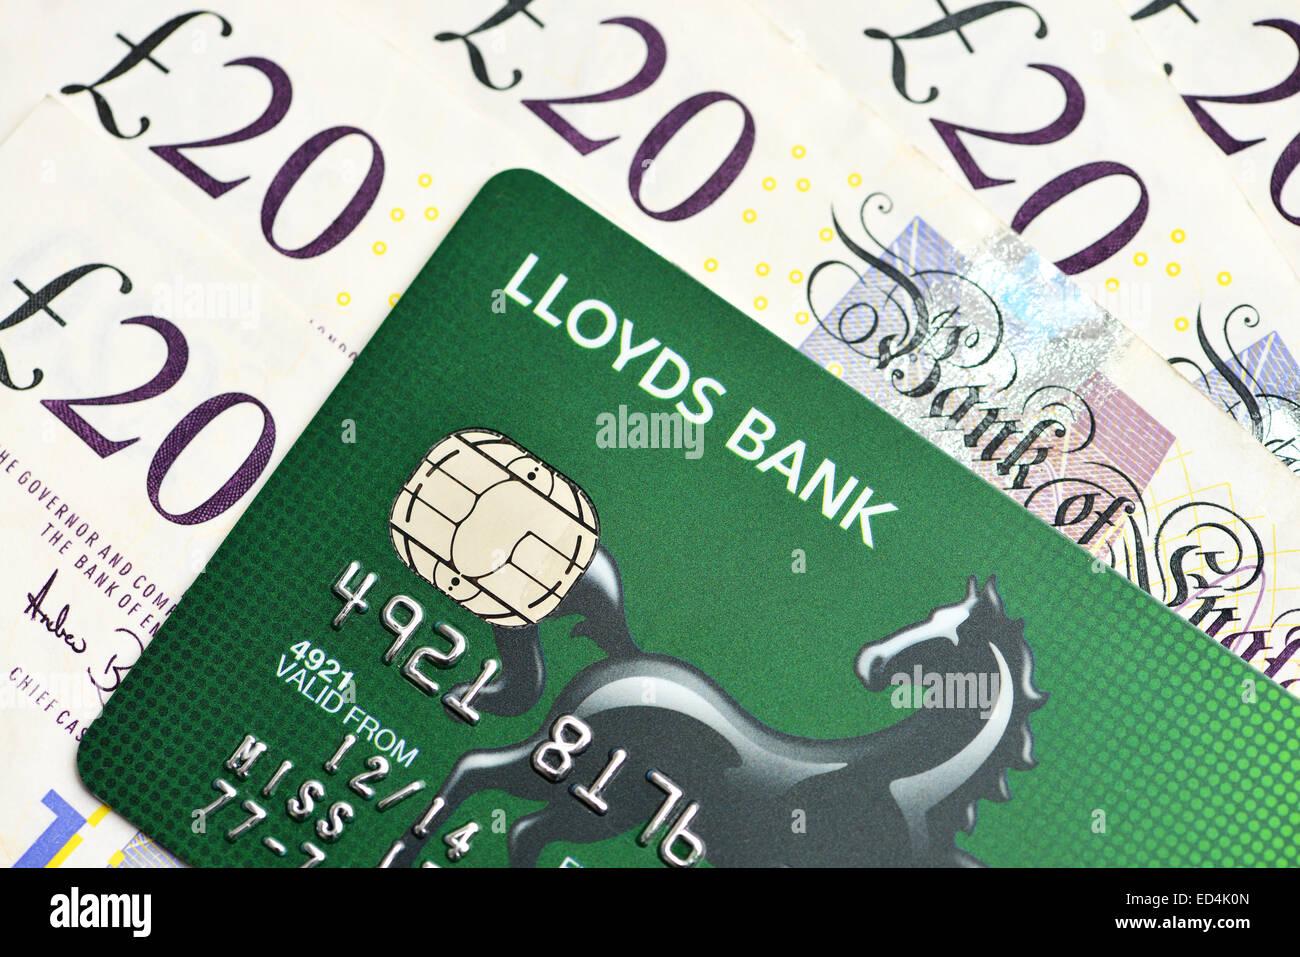 Lloyds-Kreditkarte und zwanzig Pfund Sterling Bargeld stellt fest Stockbild